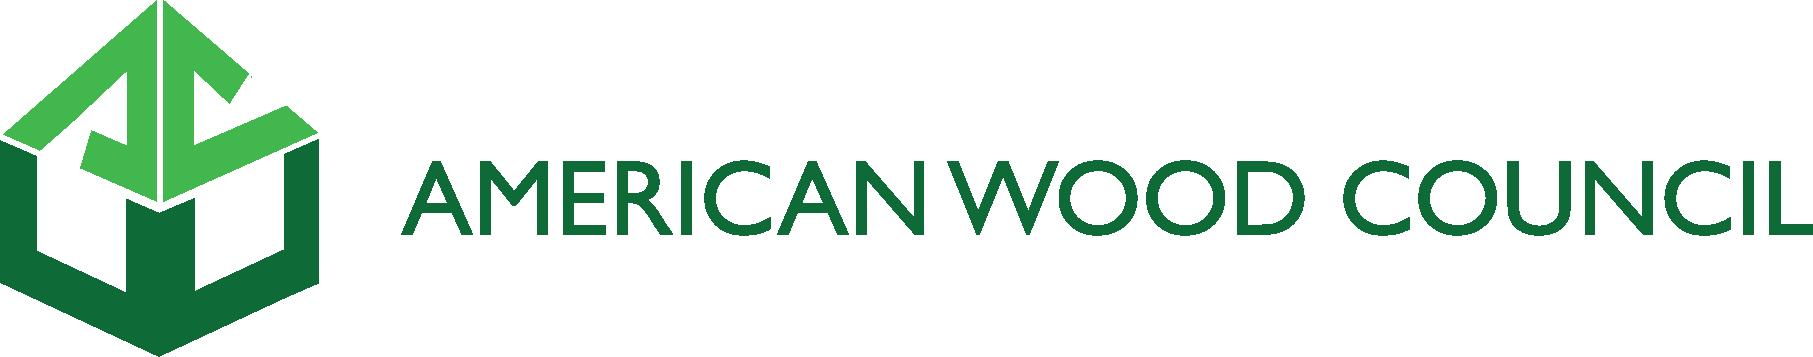 American Wood Council Logo